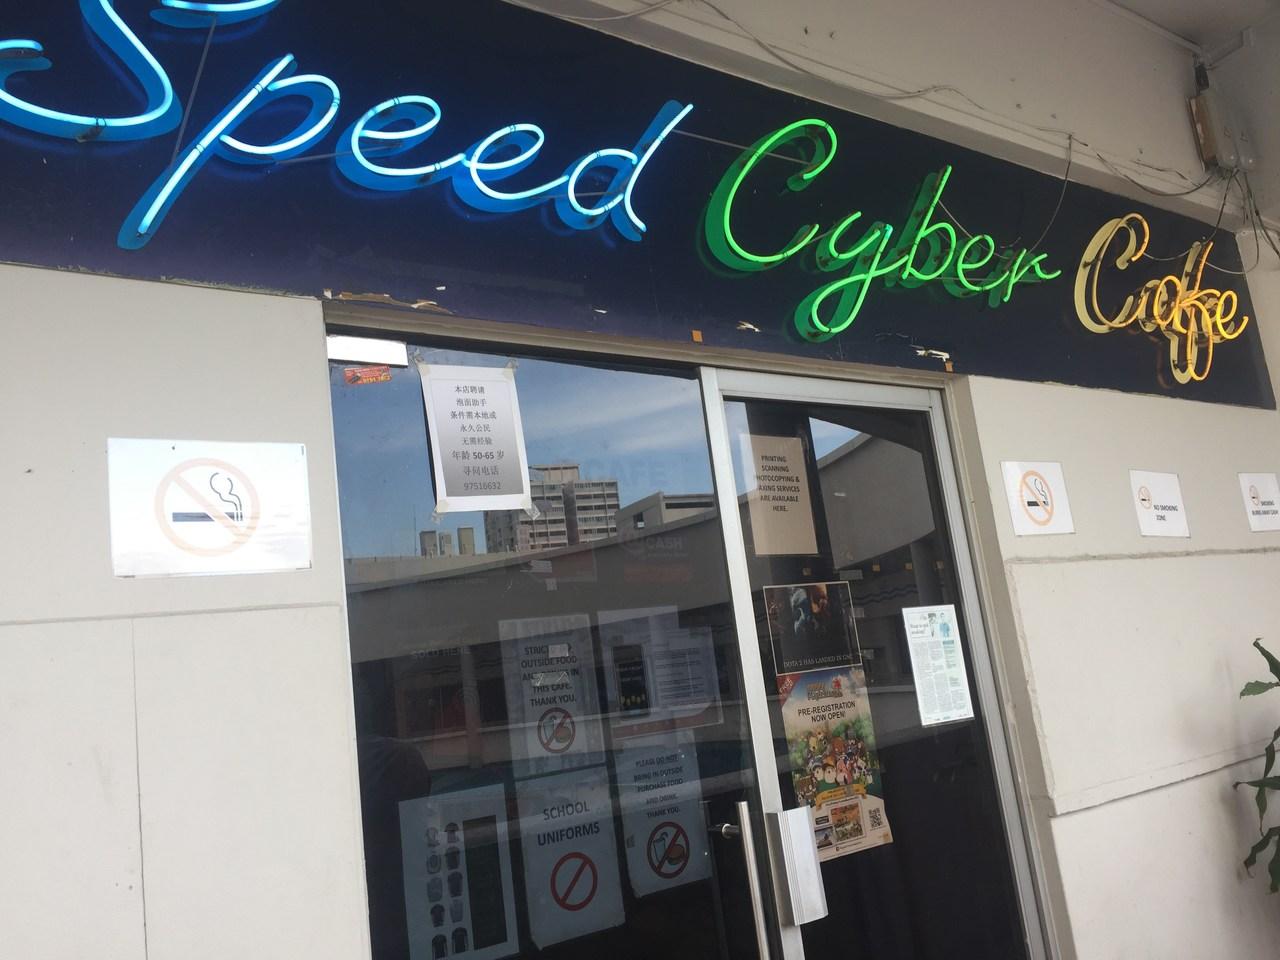 Top Internet Cafe in SG 2021